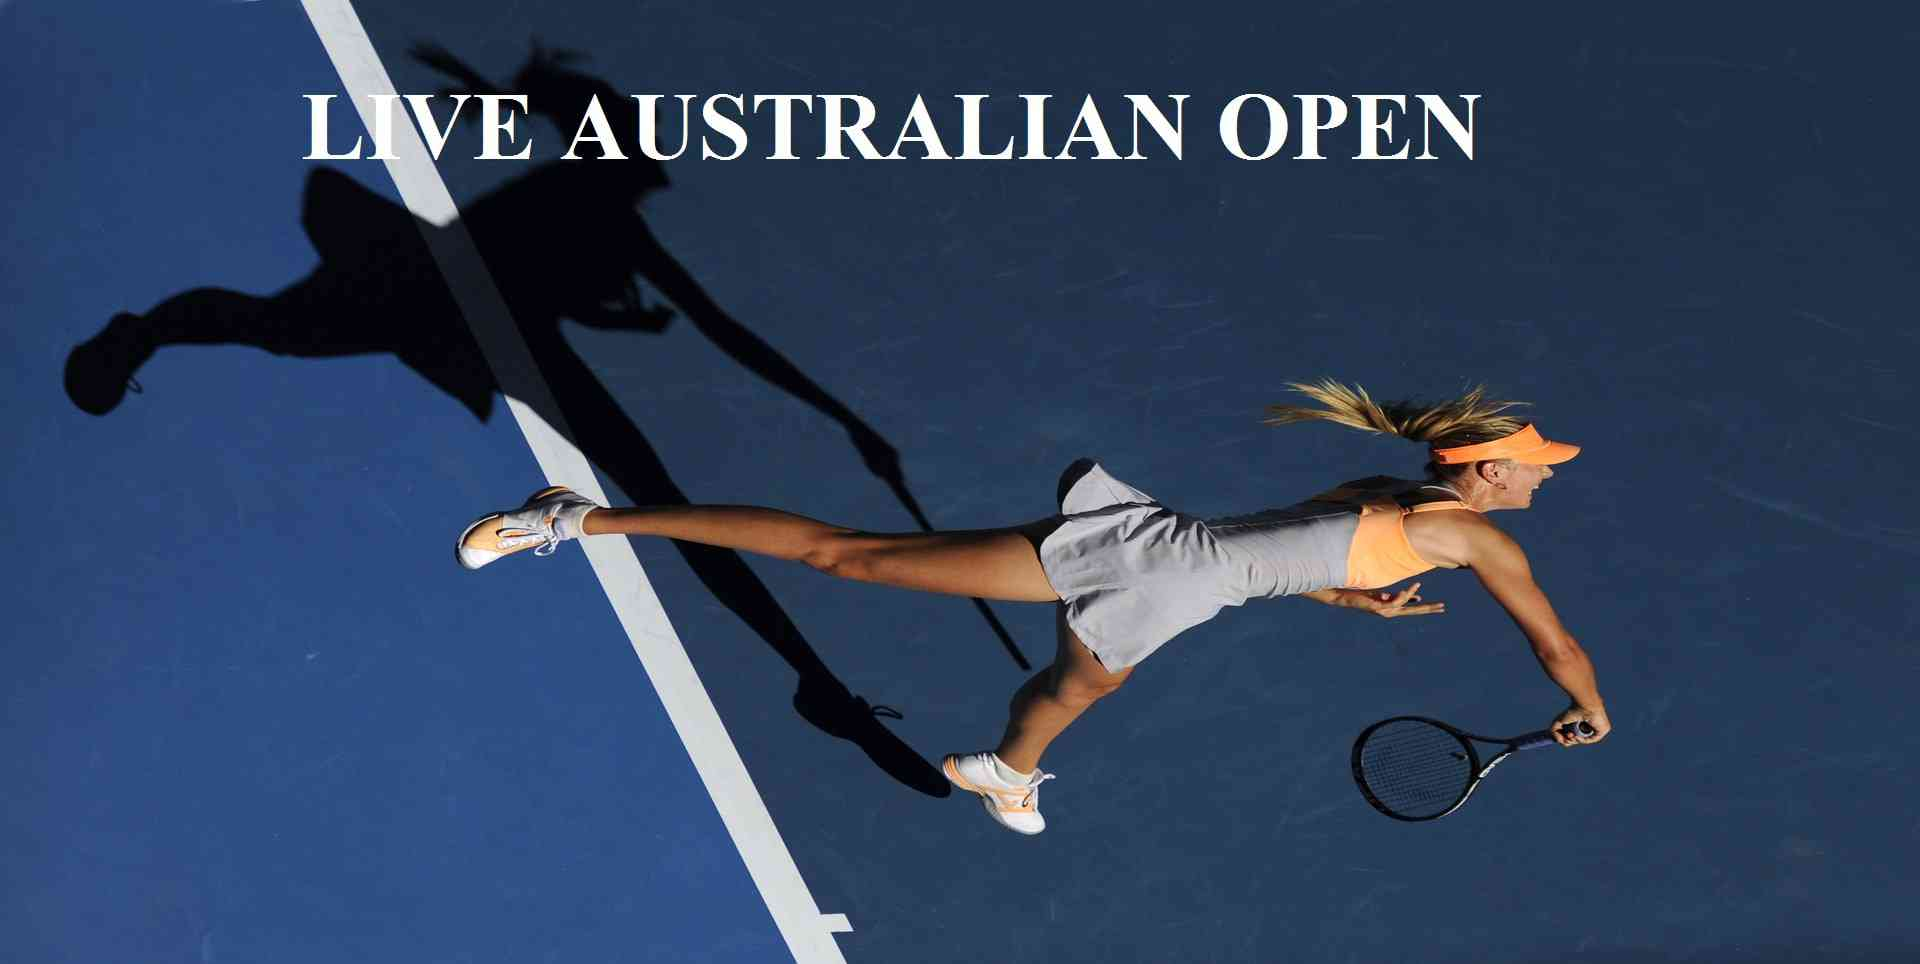 Australian Open 2017 Round 3 live